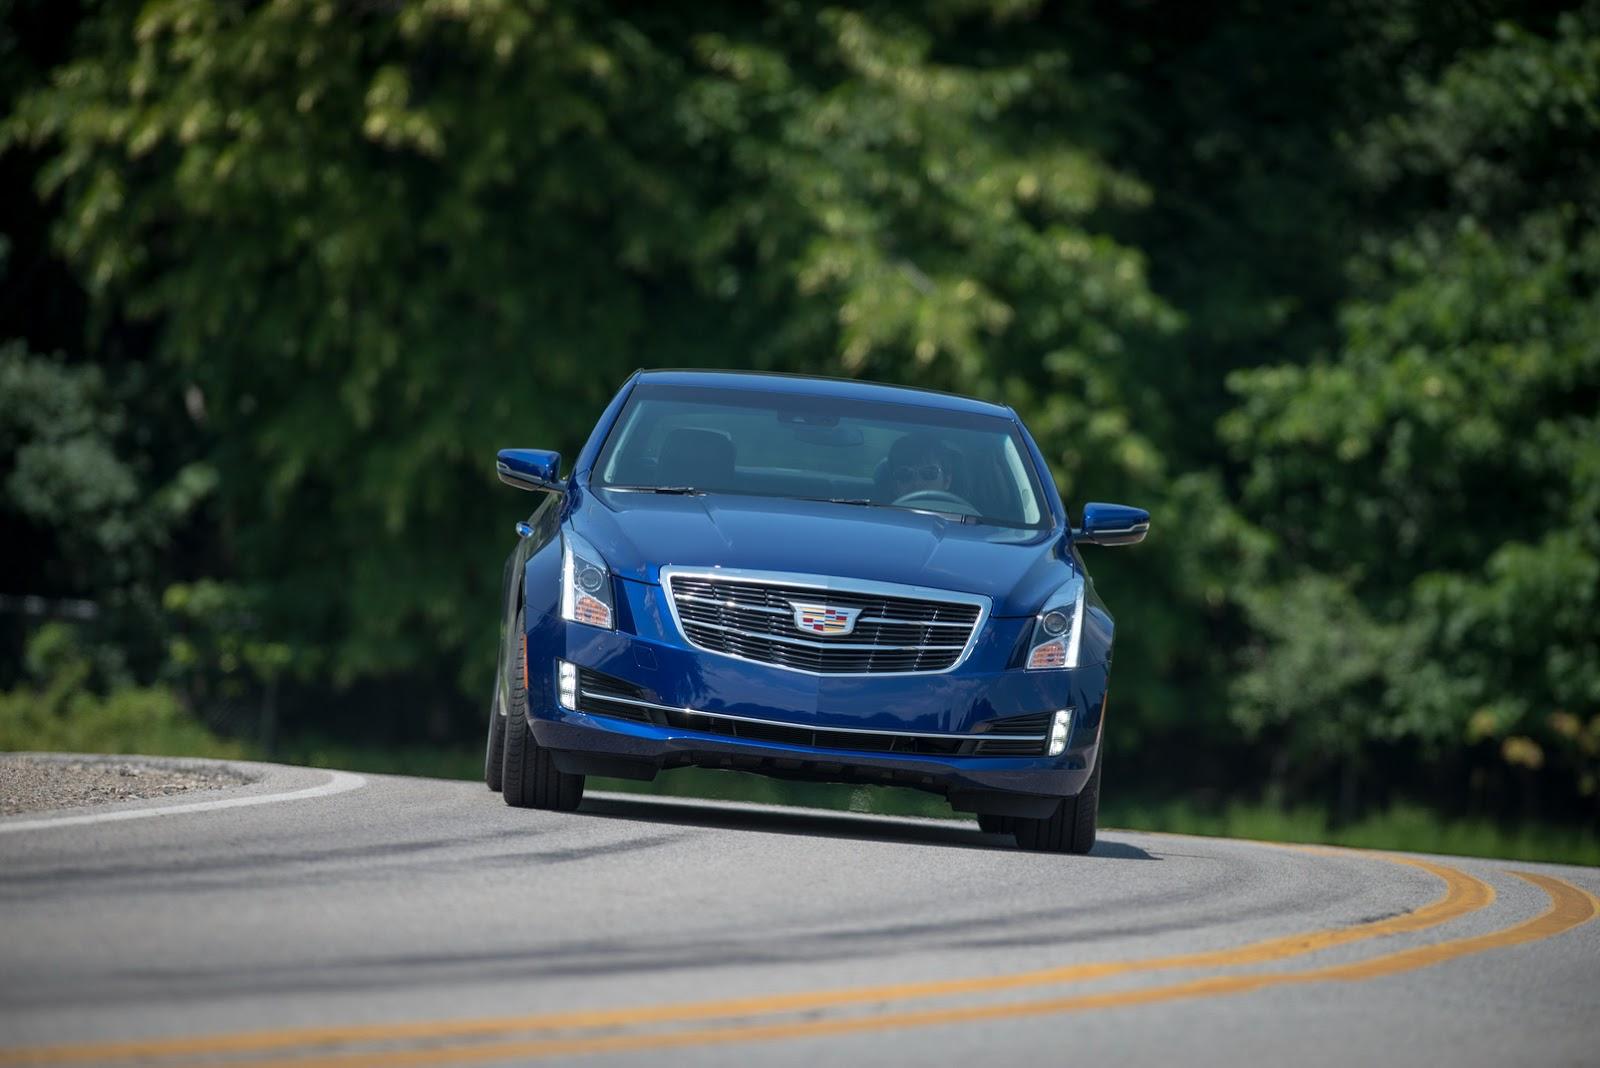 2015-Cadillac-ATScoupe-44.jpg